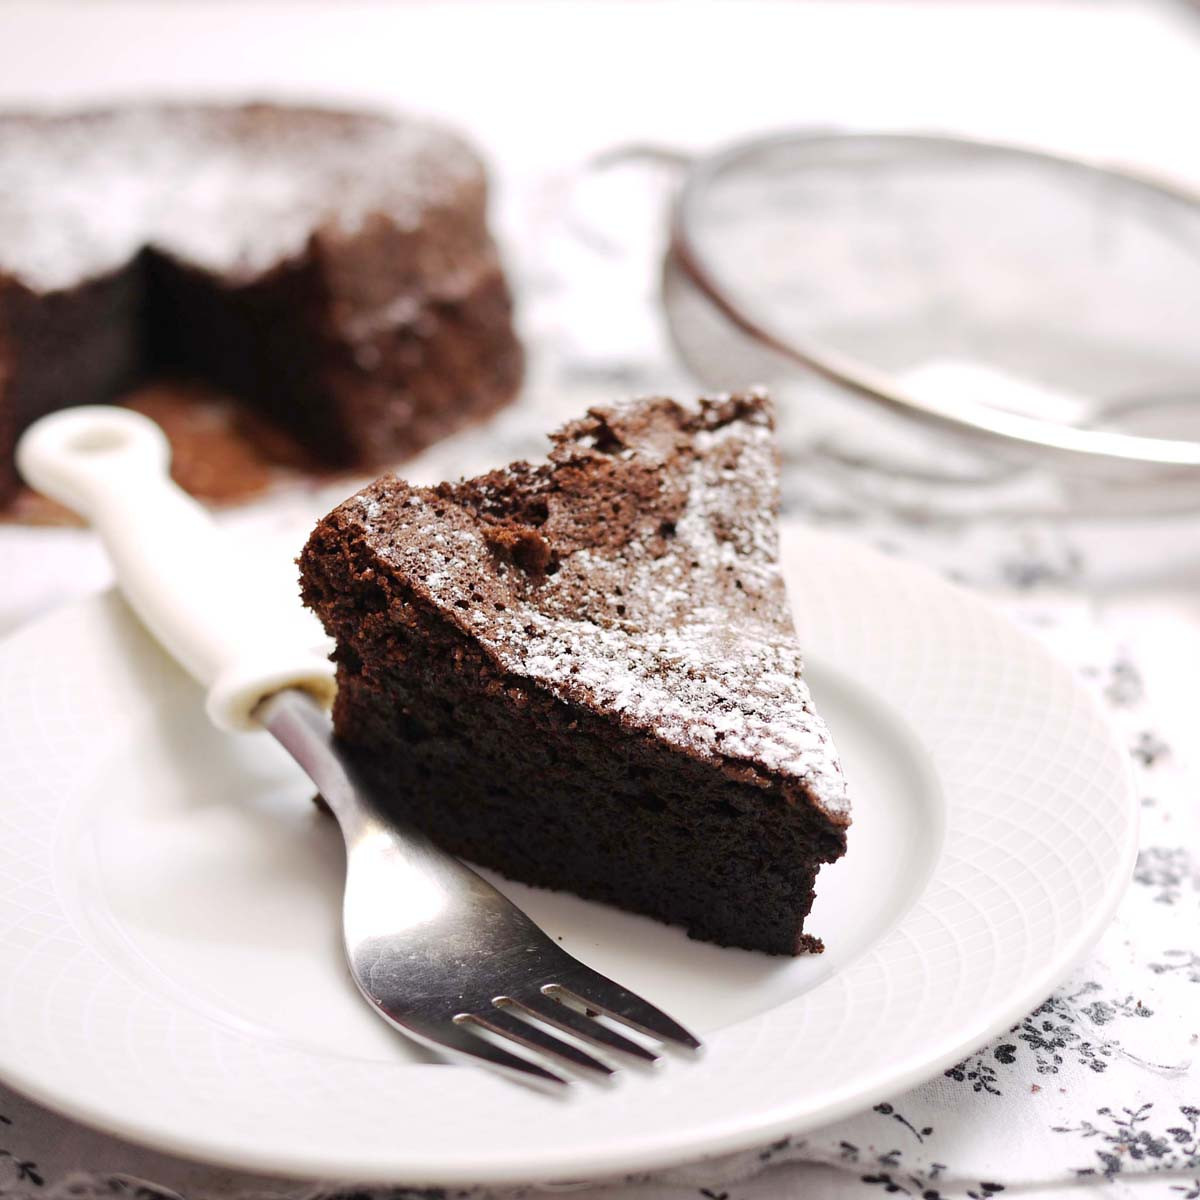 Fallen Chocolate Cake  Fallen Chocolate Cake Recipe — Dishmaps